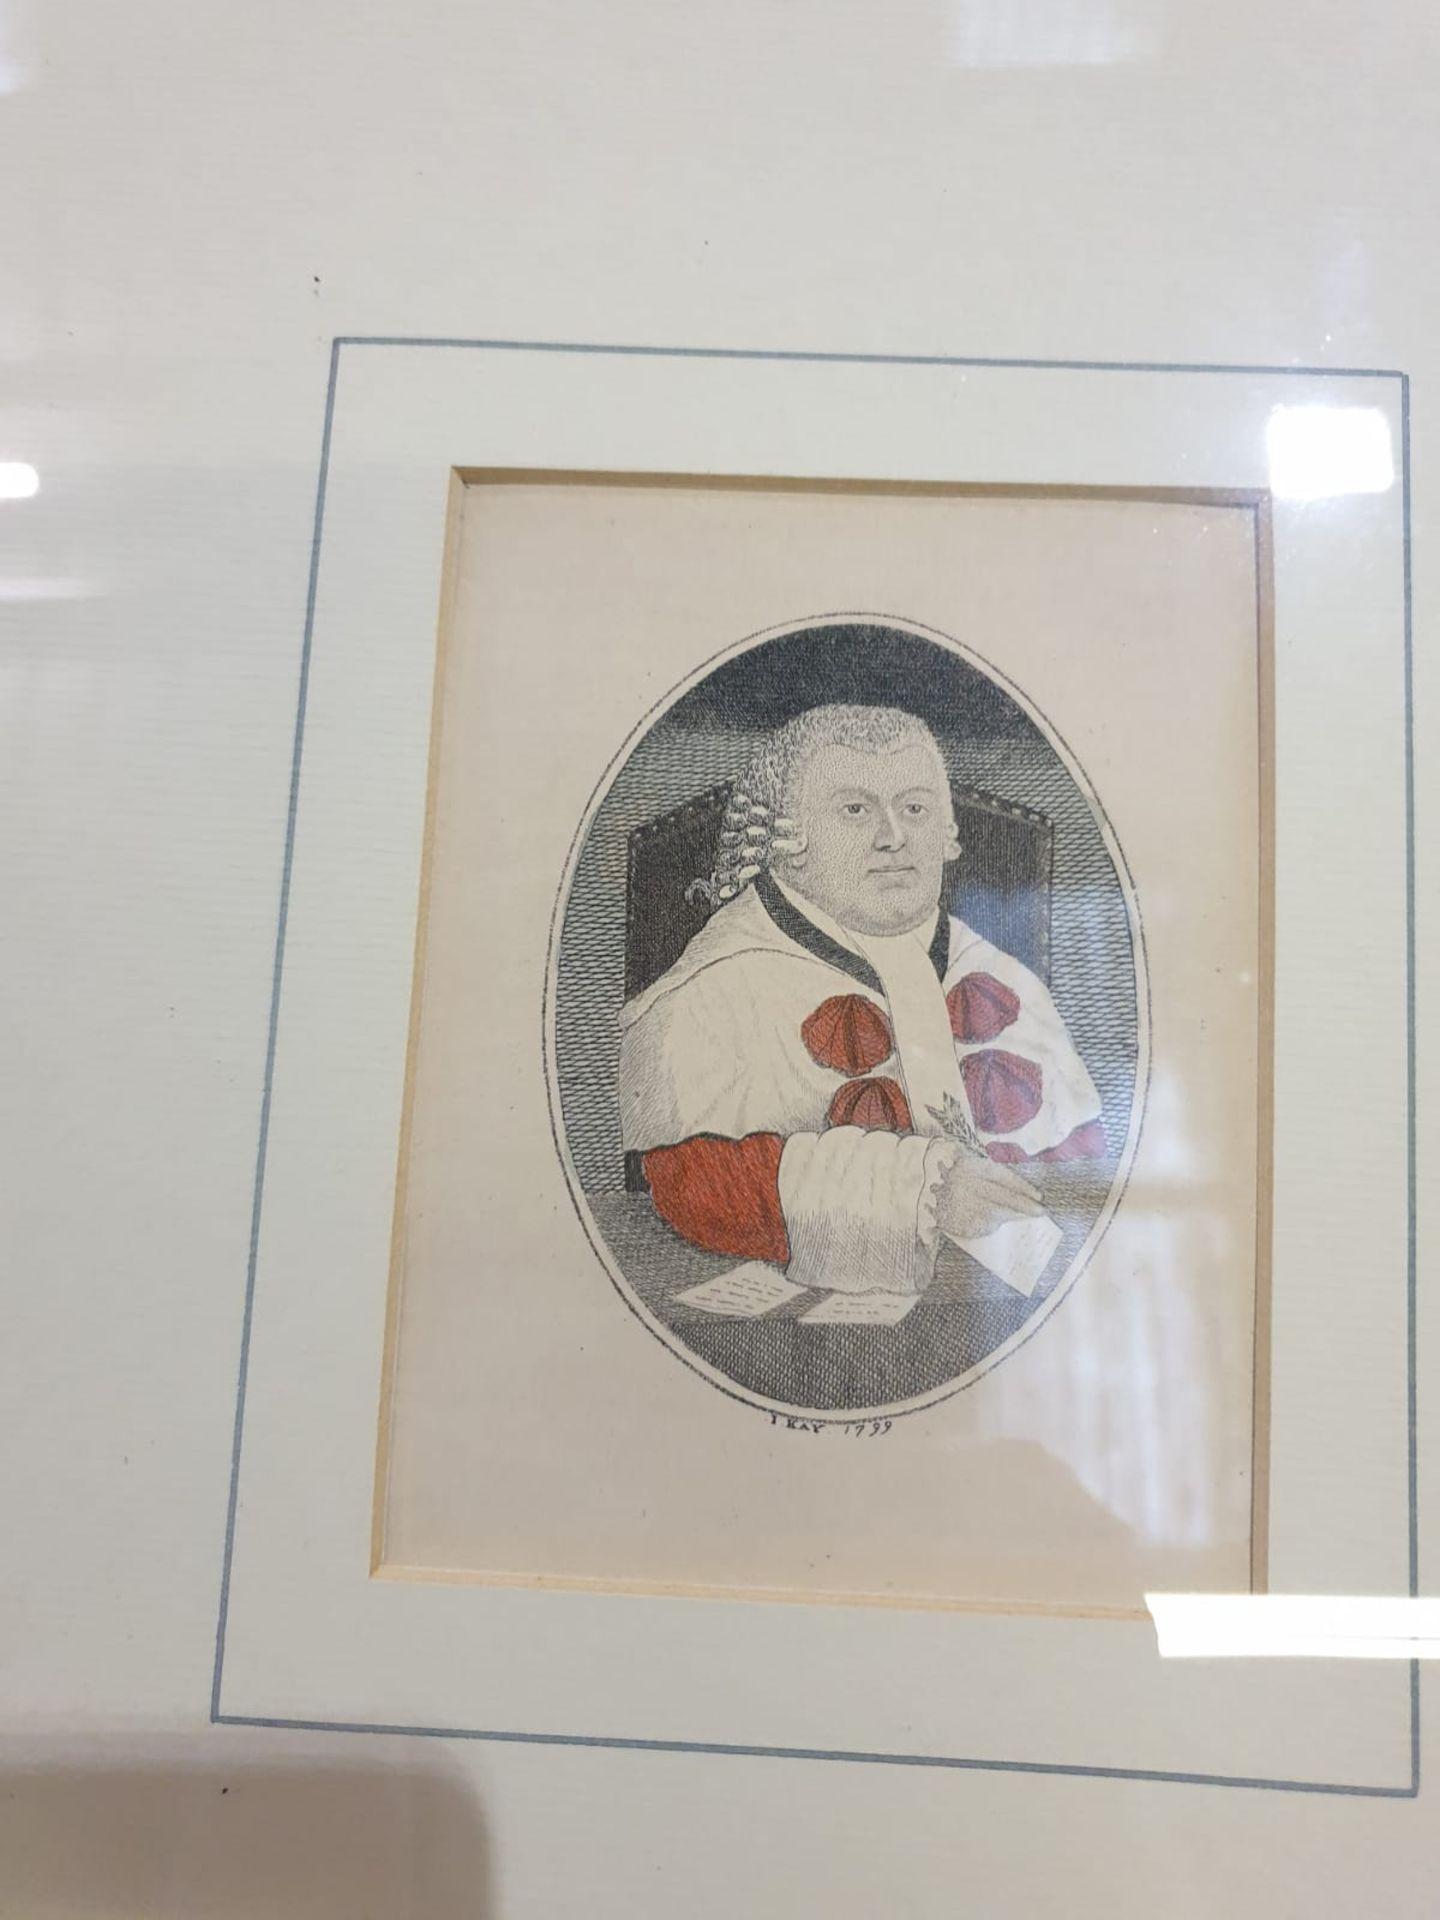 A set of 4 framed John Kay coloured prints of etchings Law gentlemen Lord Balmuto by John Kay, 1799, - Image 4 of 5